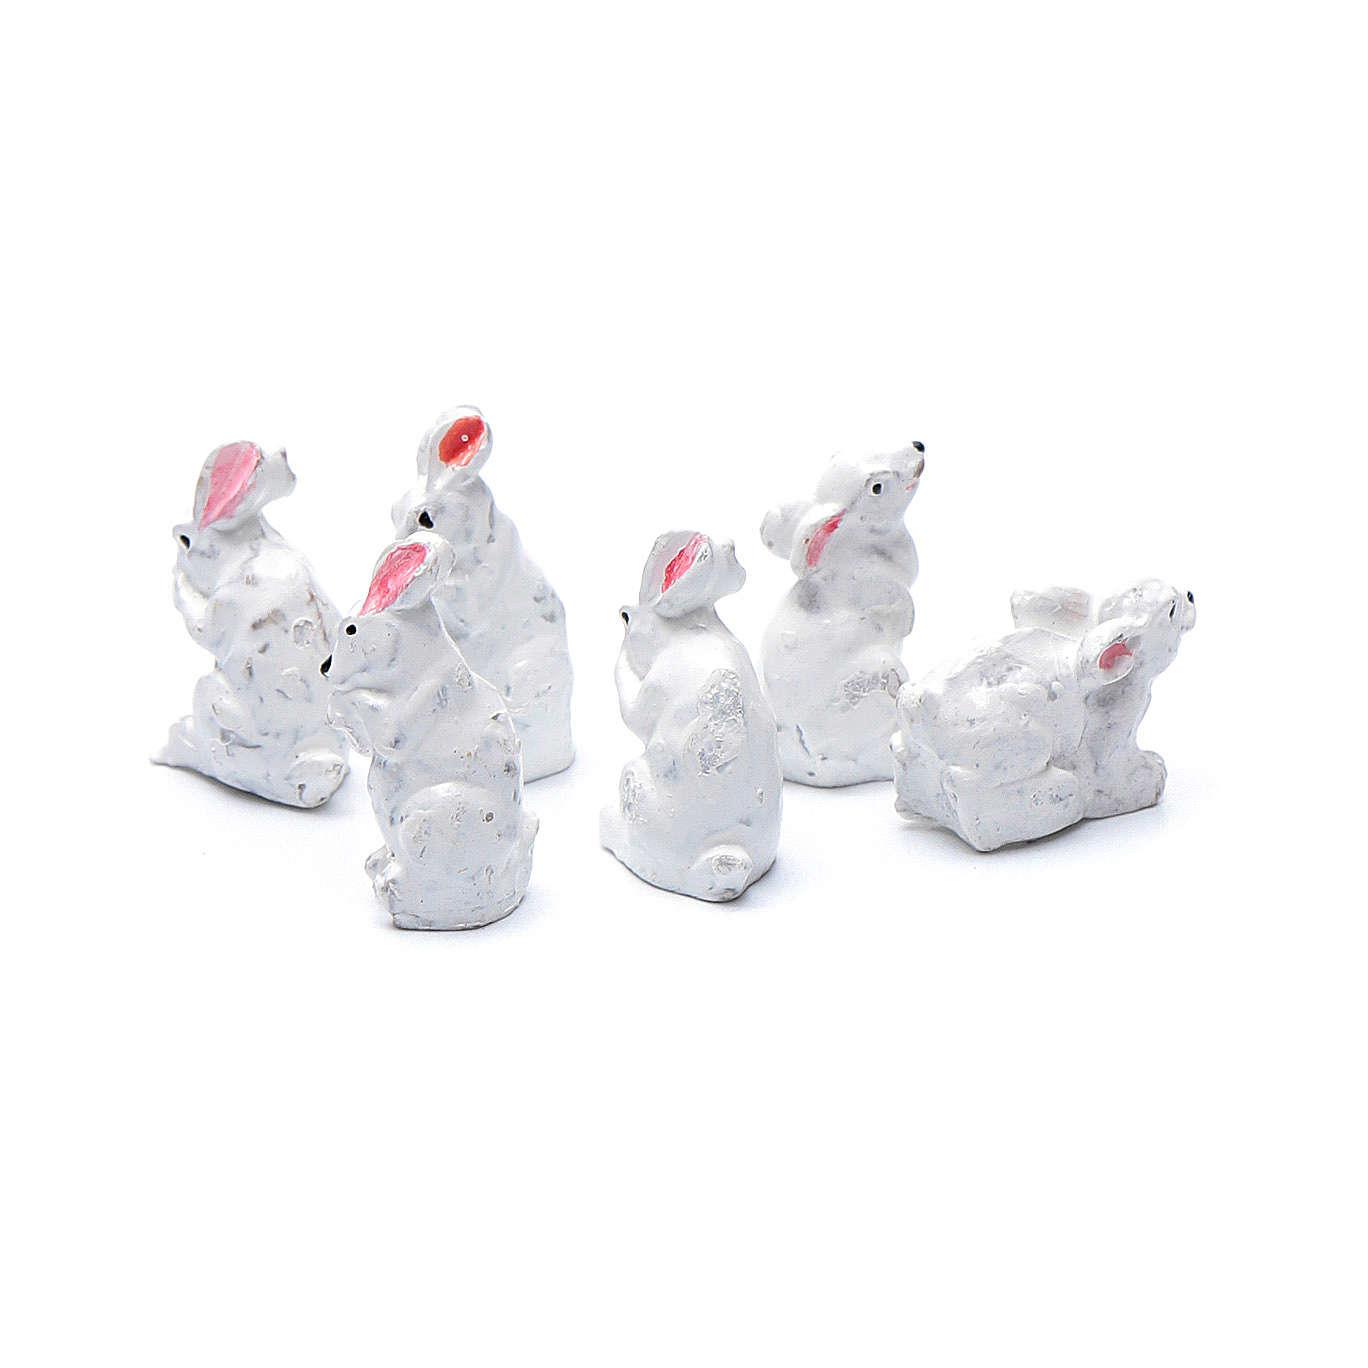 Conigli 6 pz resina presepe h reale 2 cm 3